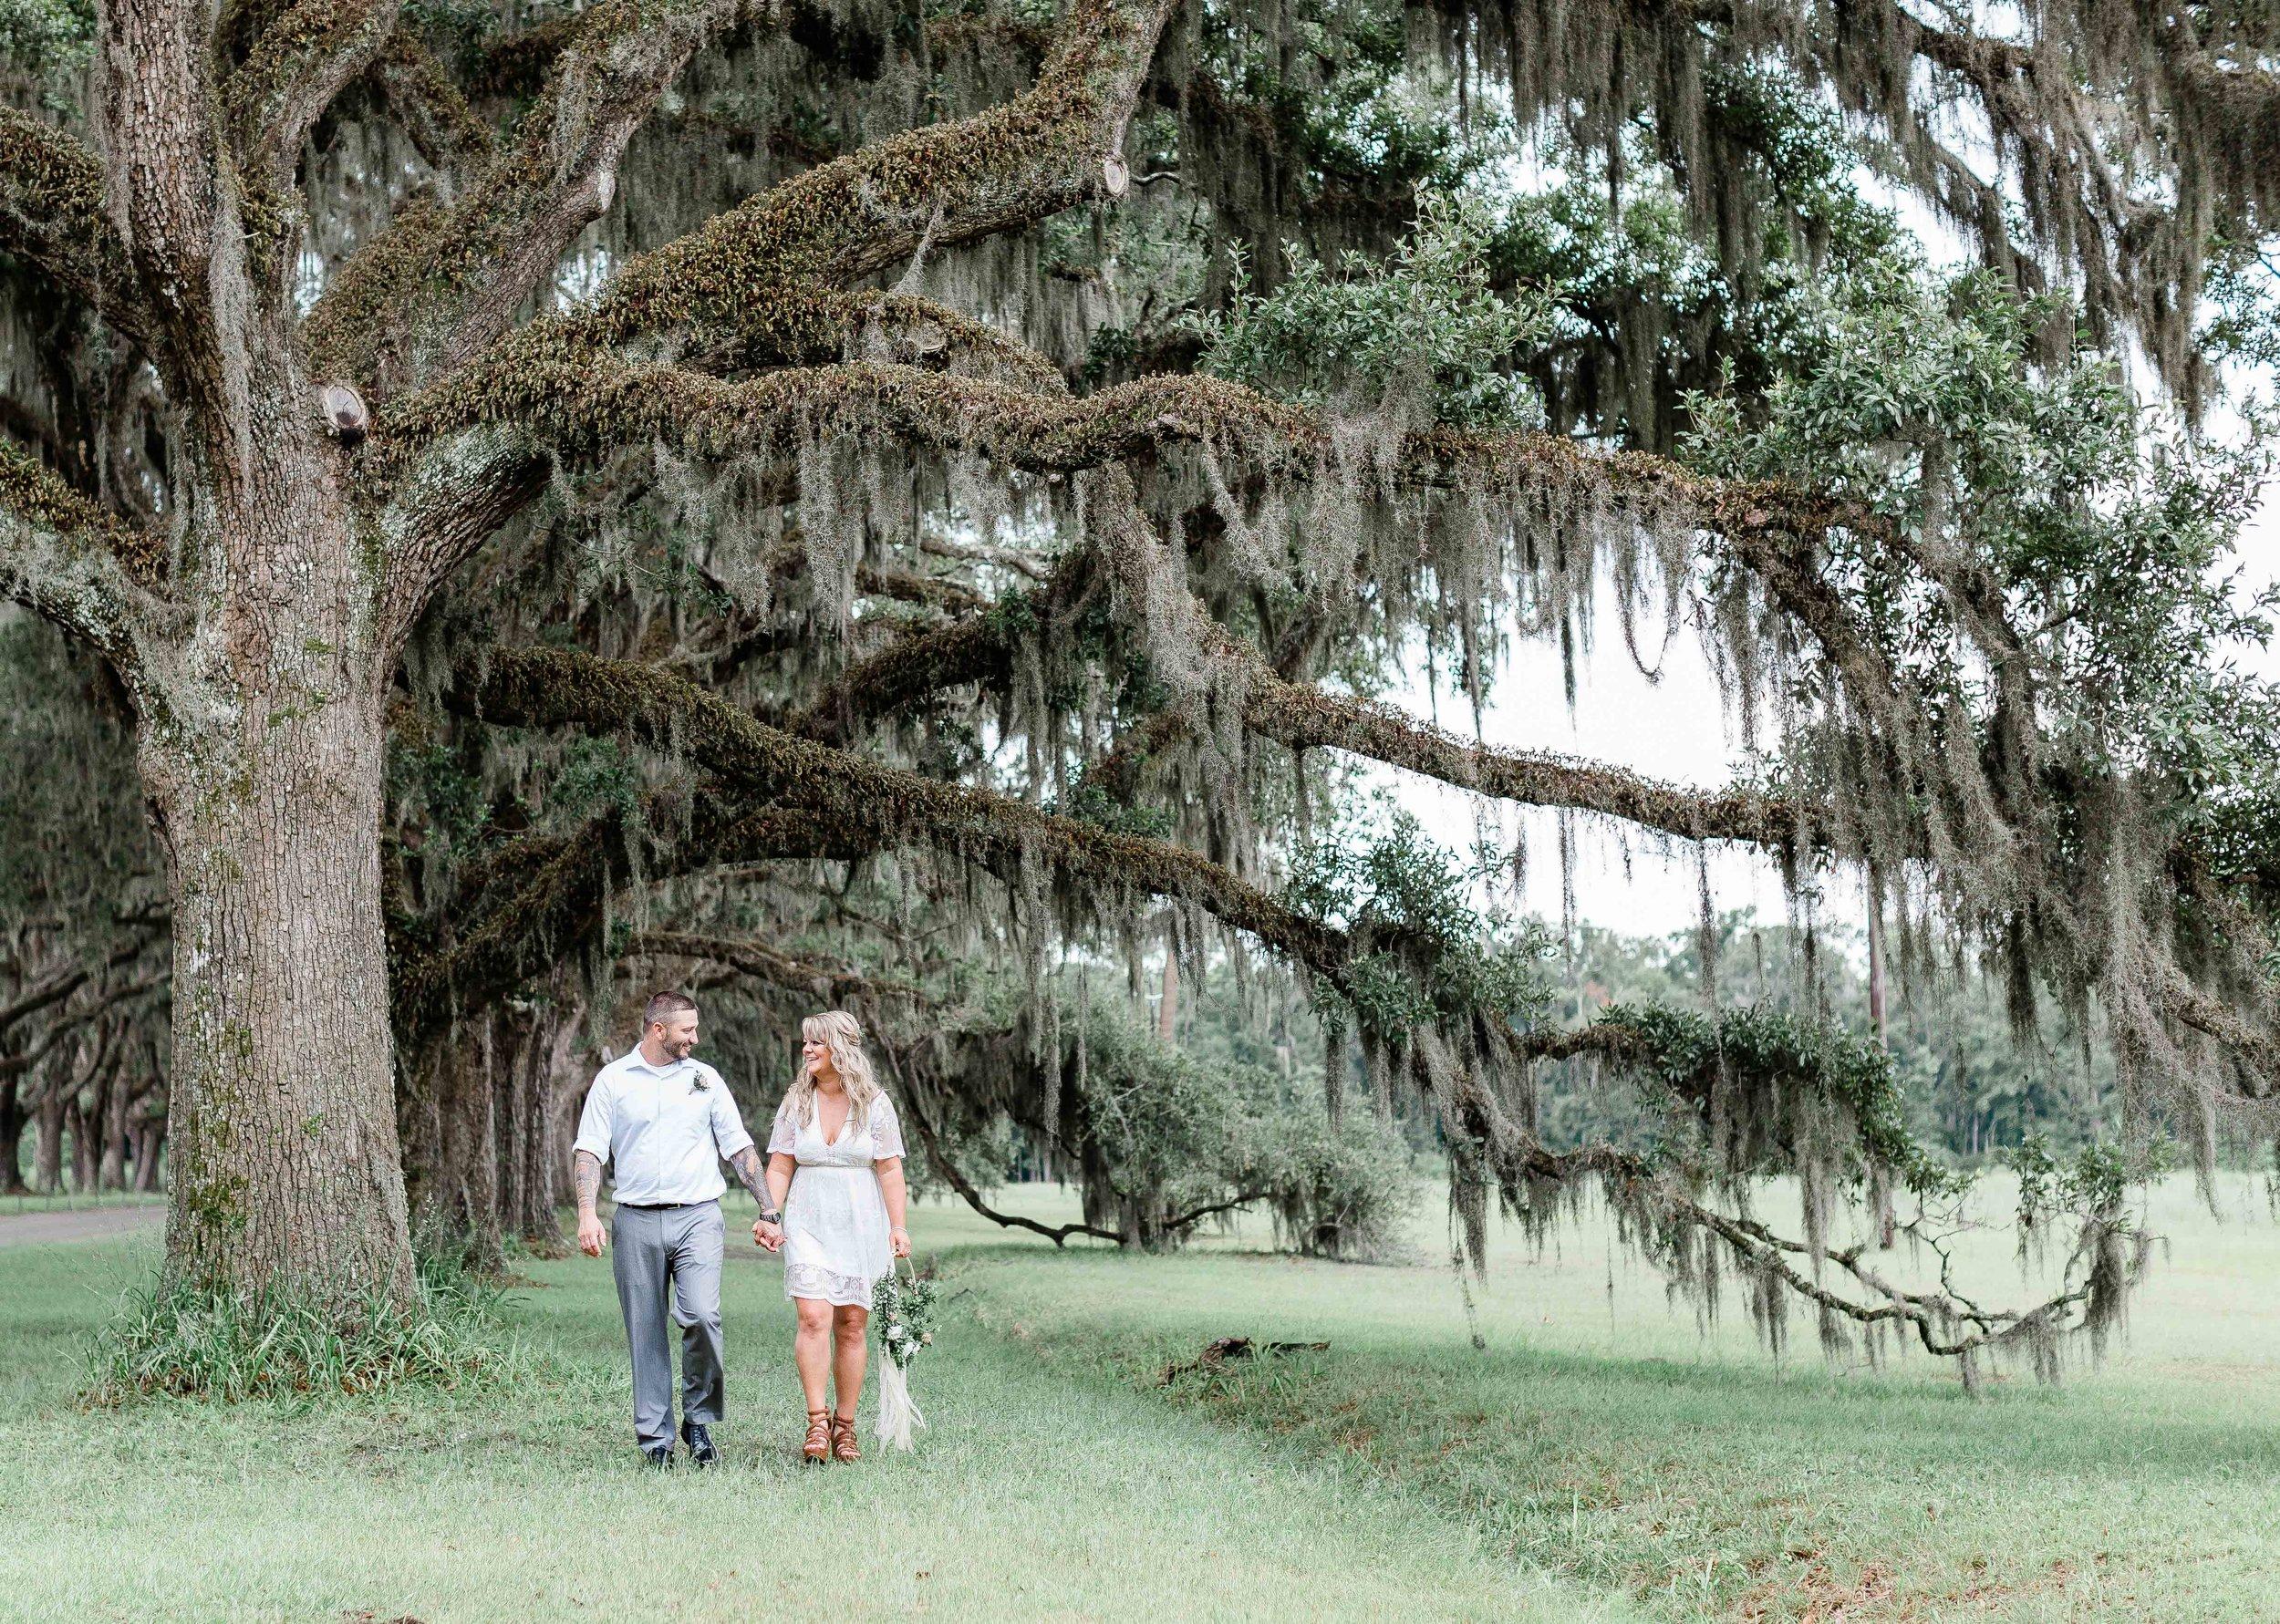 20190727Georgia-Wormlsoe Plantation-Simply Eloped-Savannah Wedding Photographer- Southern Lens Photography15.jpg